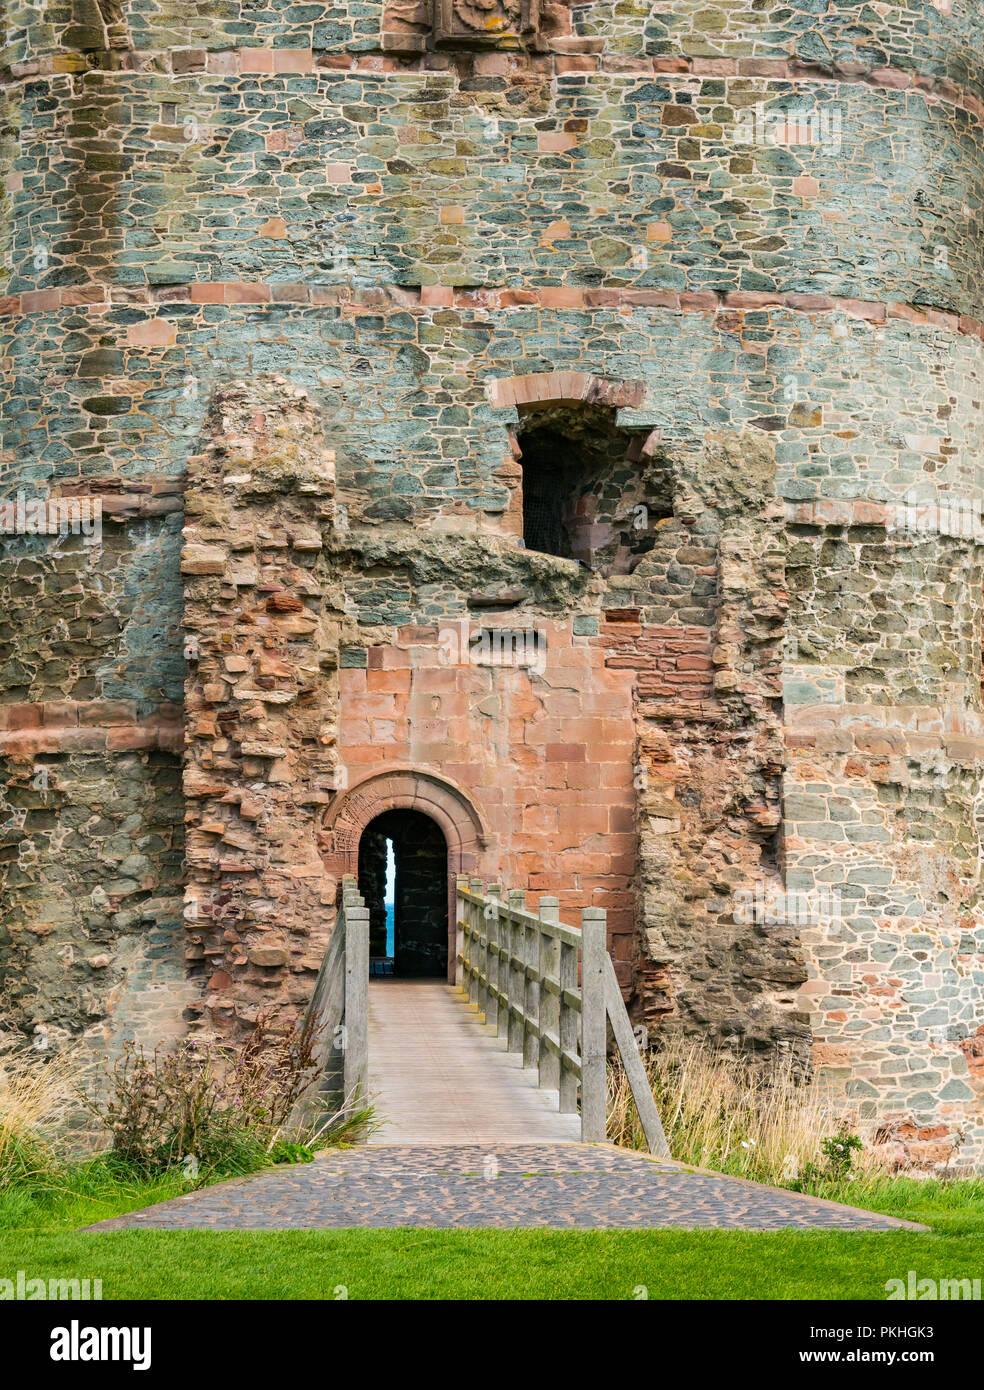 Moat bridge entrance of 14th century curtain wall fortified Tantallon Castle, North Berwick, East Lothian, Scotland, UK - Stock Image